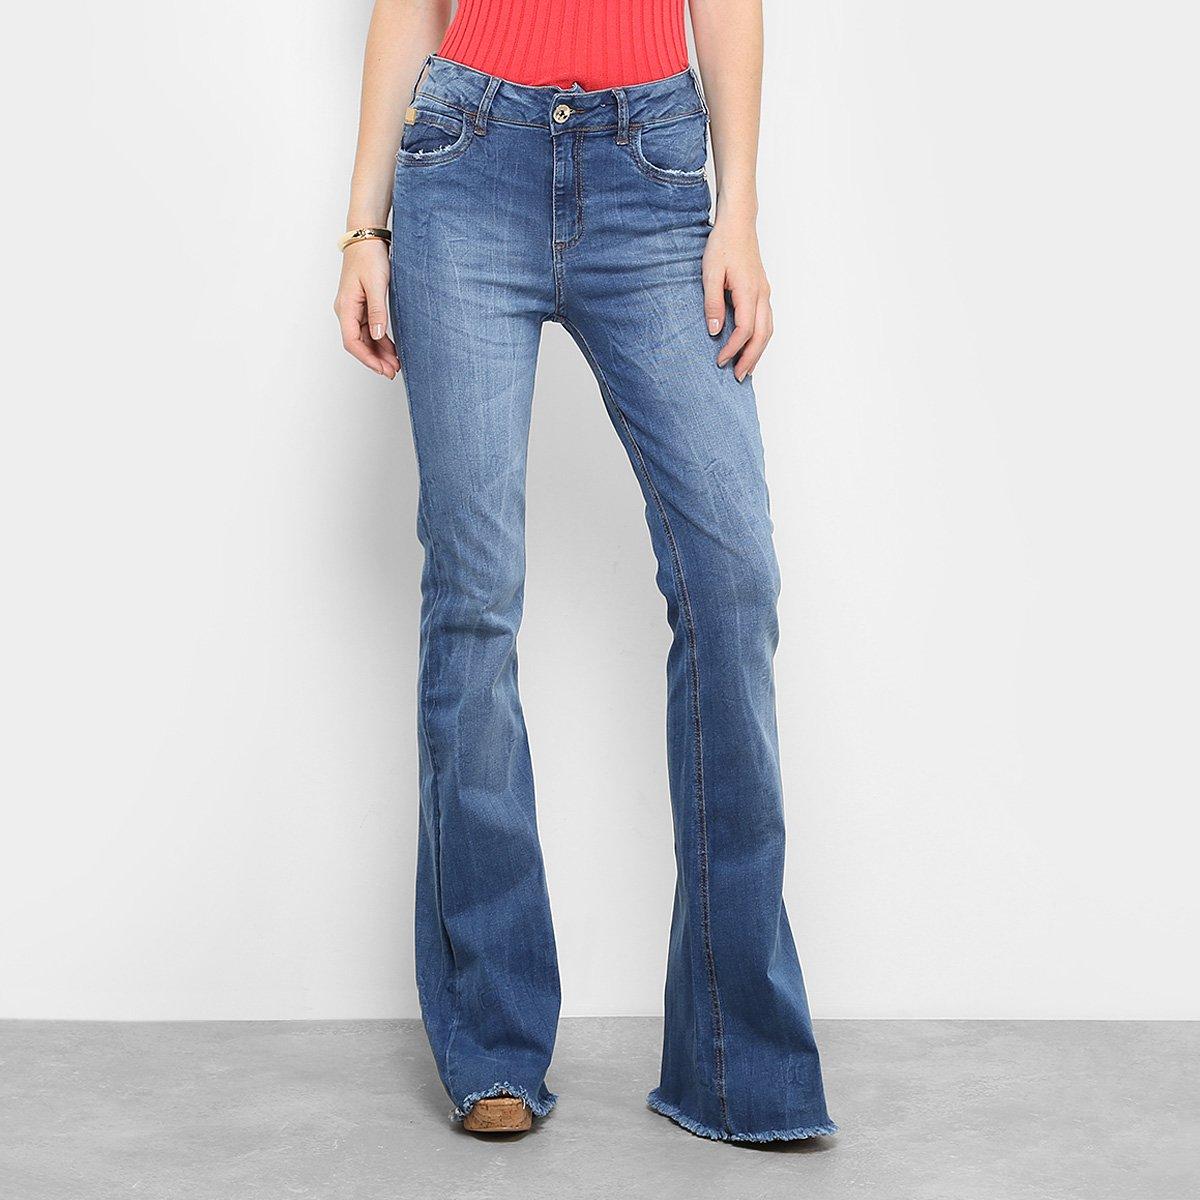 232462948a Calça Jeans Flare Colcci Base Bia Rasgada Cintura Alta Feminina - Compre  Agora